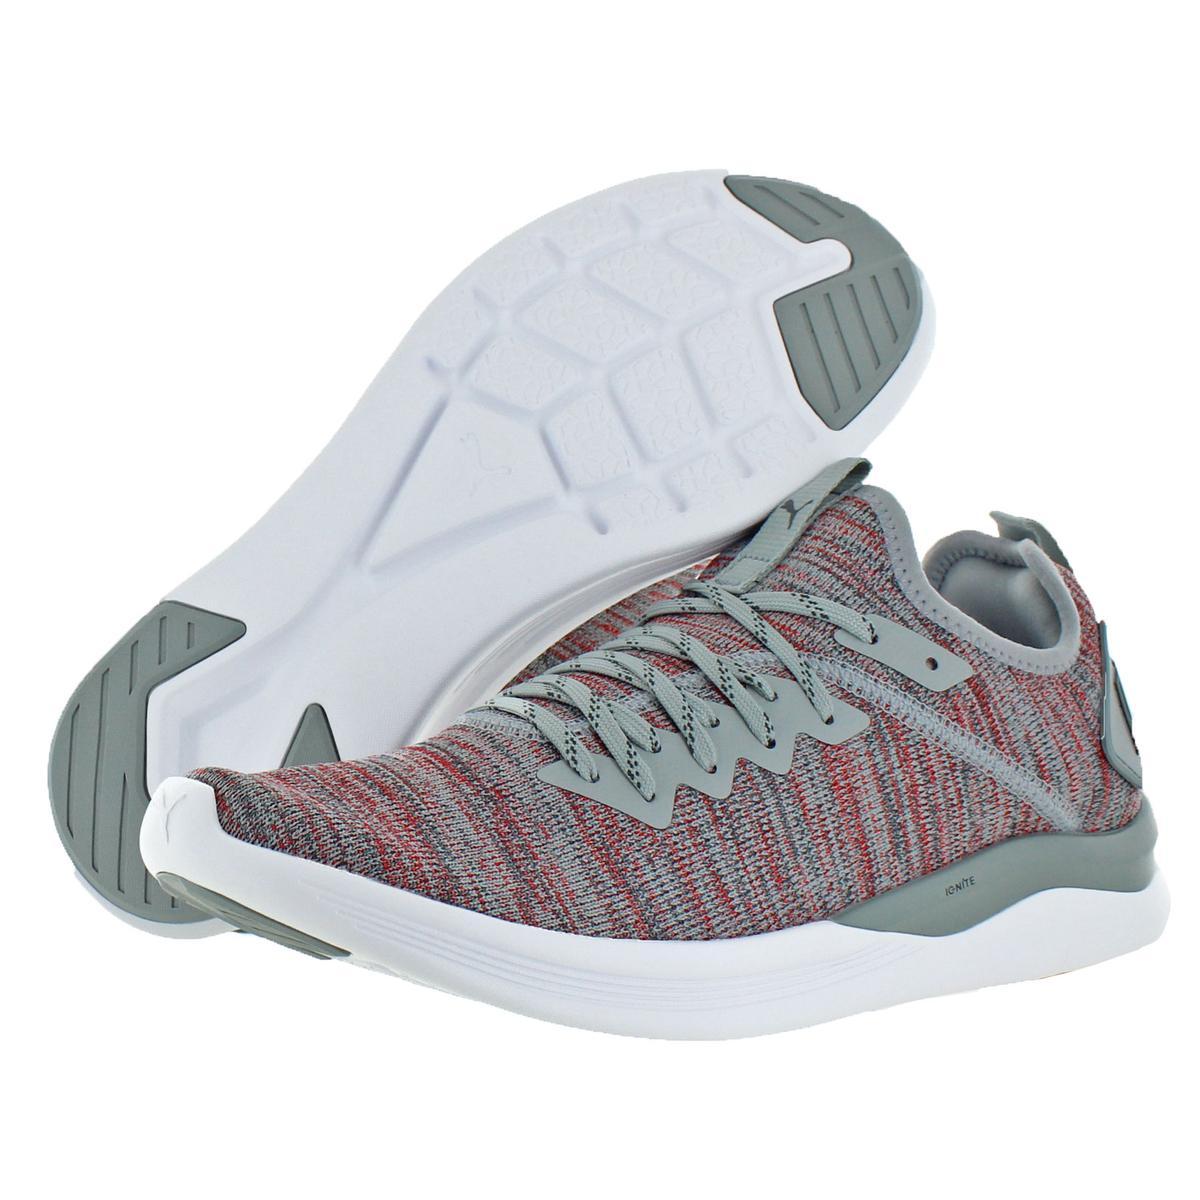 Puma-IGNITE-Flash-evoKNIT-Men-039-s-Knit-Mid-Top-Athleisure-Trainer-Sneaker-Shoes thumbnail 8